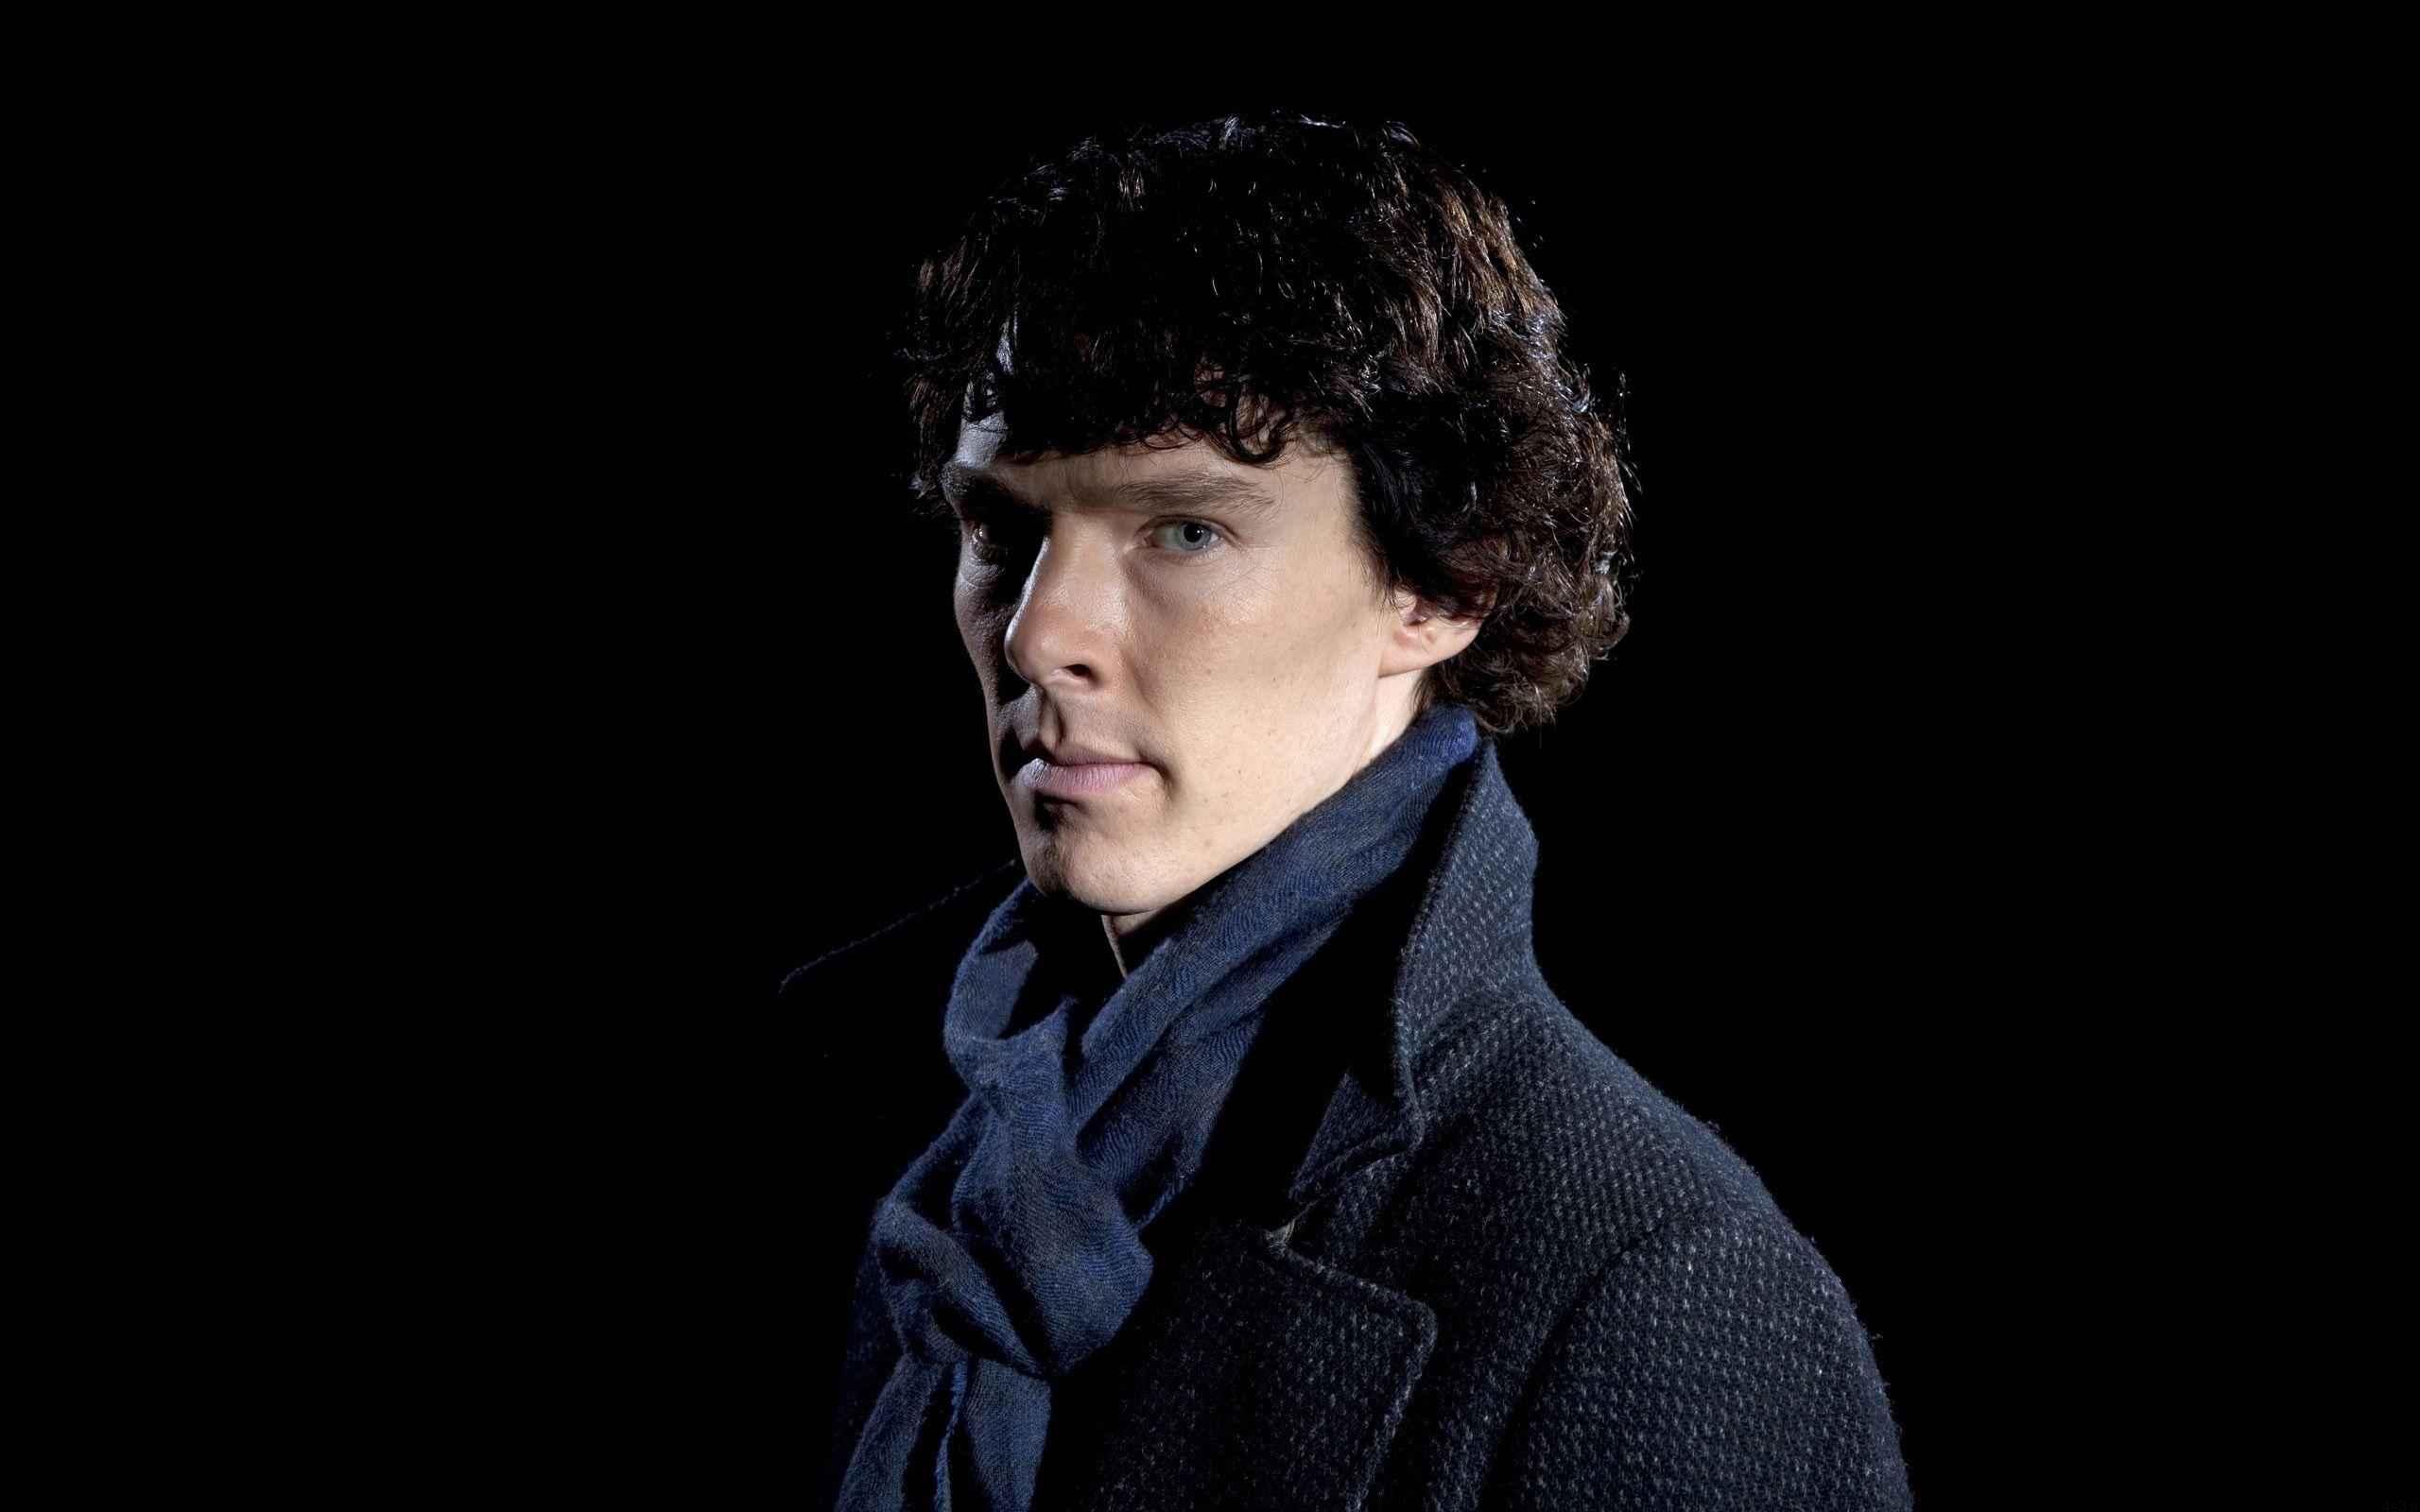 Benedict Cumberbatch Wallpapers  تصاویر بندیکت کامبربچ - سایت 4s3.ir